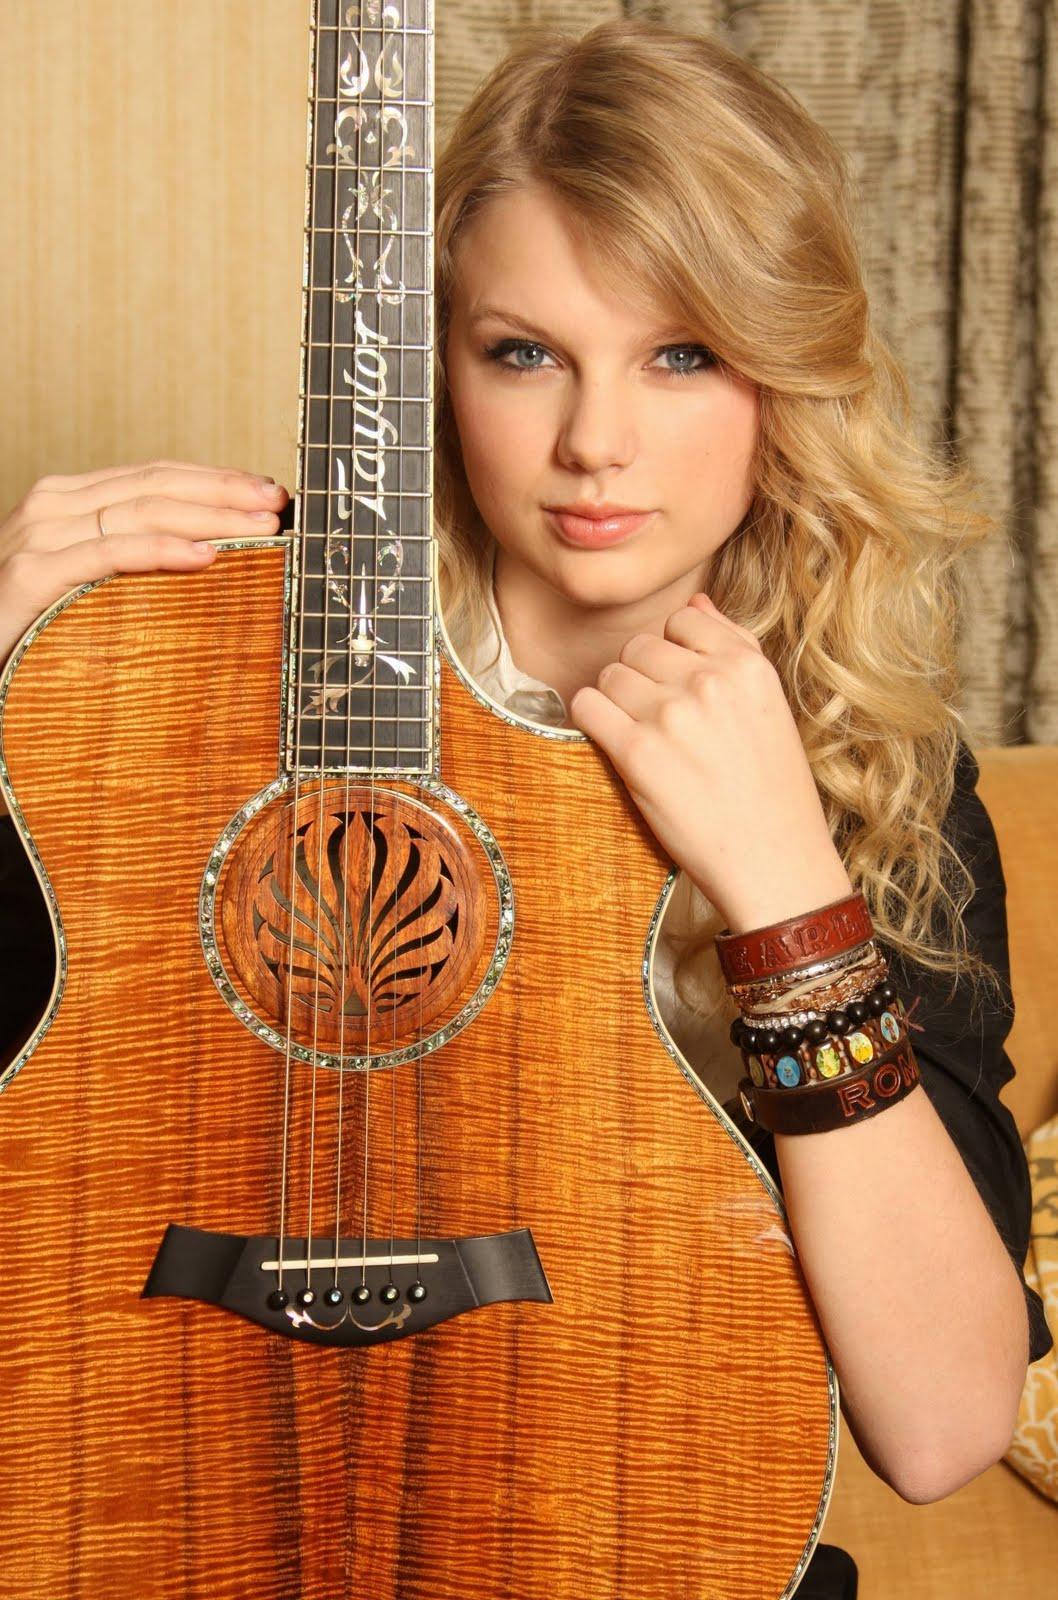 http://3.bp.blogspot.com/-zU9Wg5VqJj0/USx4mgAdWII/AAAAAAAAEIo/yiWmhJ4VRzI/s1600/Taylor+Swift+With+Guitar.jpg